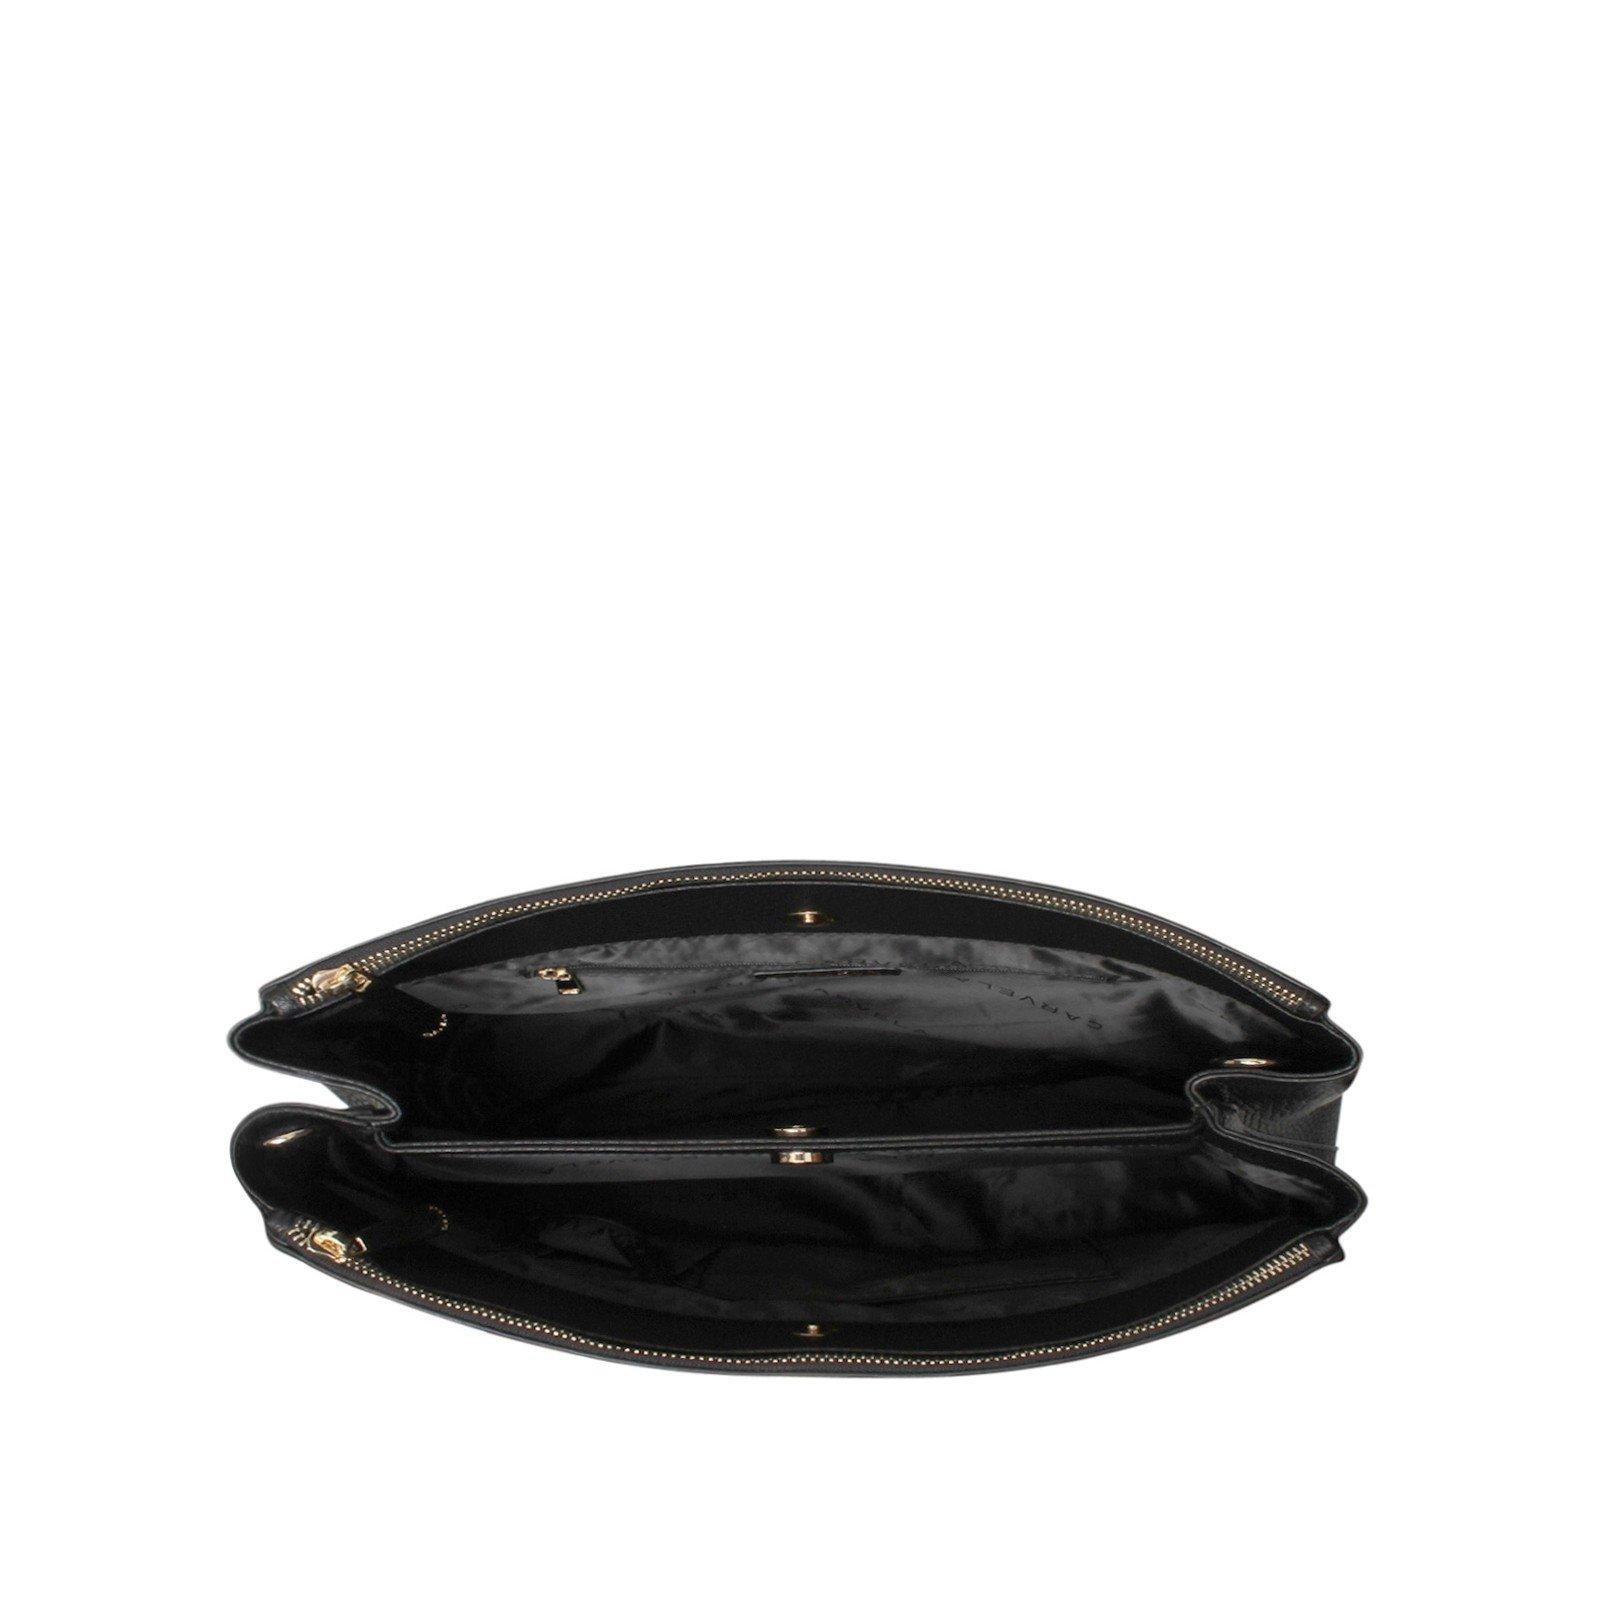 Carvela Kurt Geiger Cala Double Zip Tote in Black